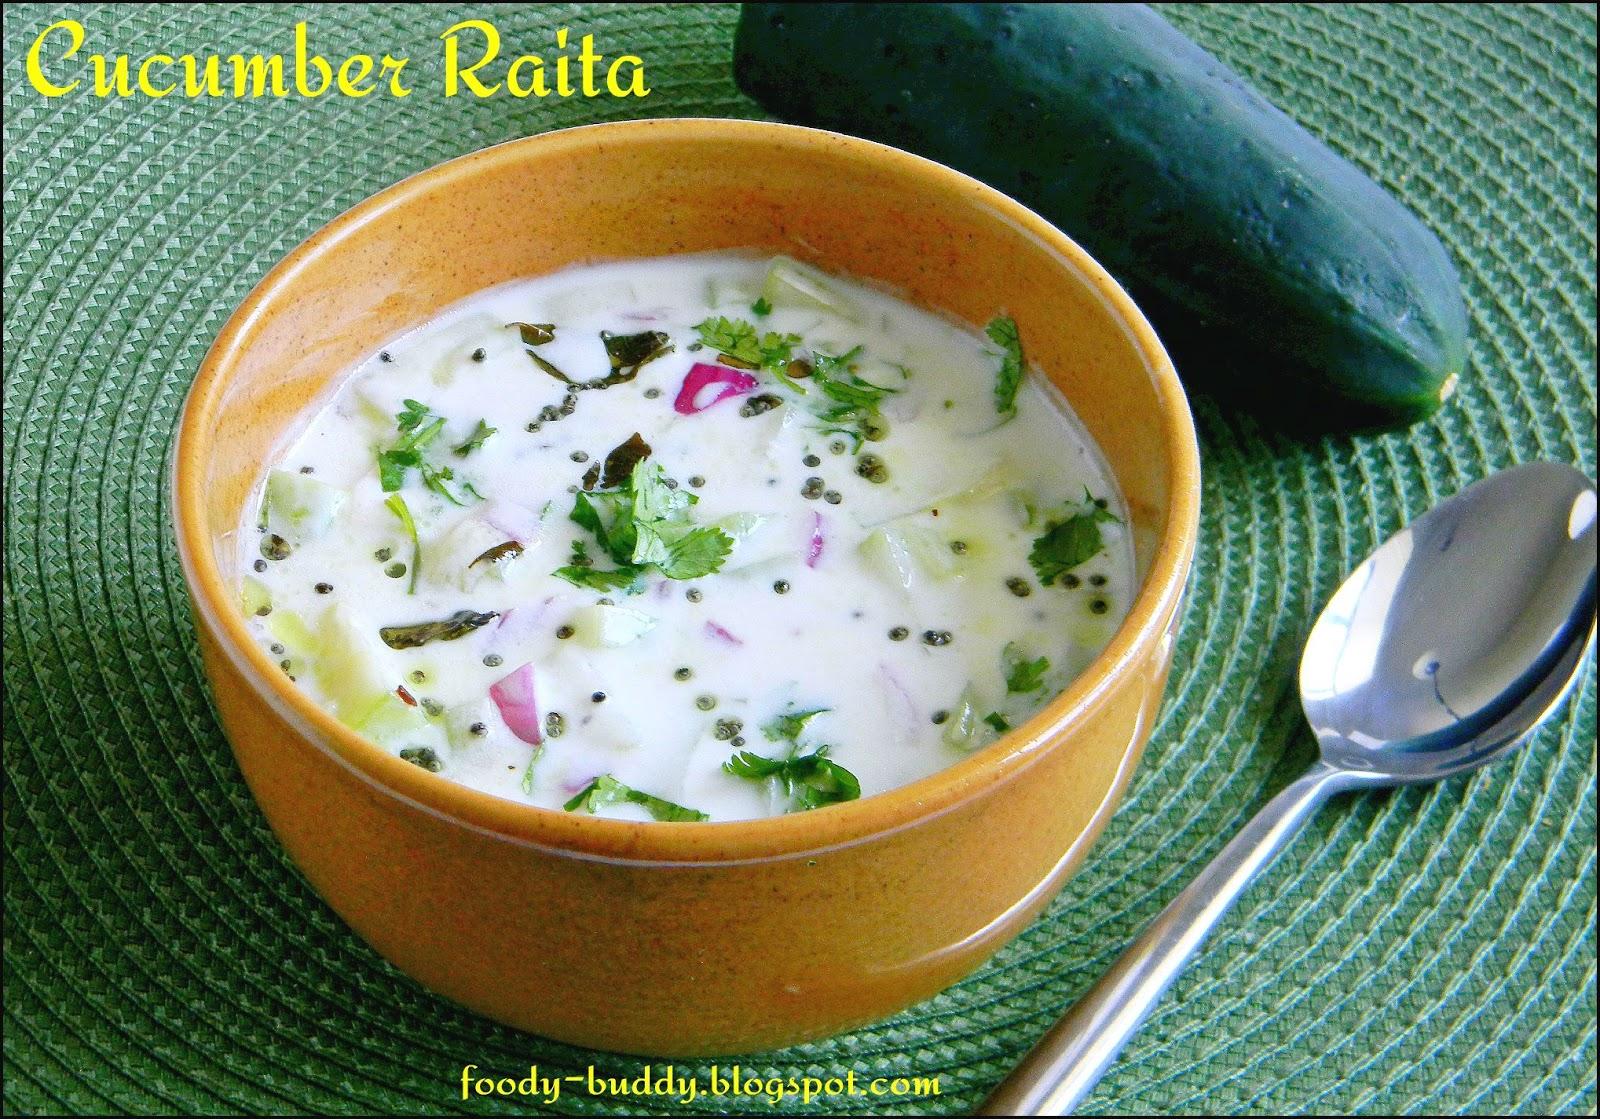 Cucumber Raita / Cucumber Yogurt Salad - FoodyBuddy